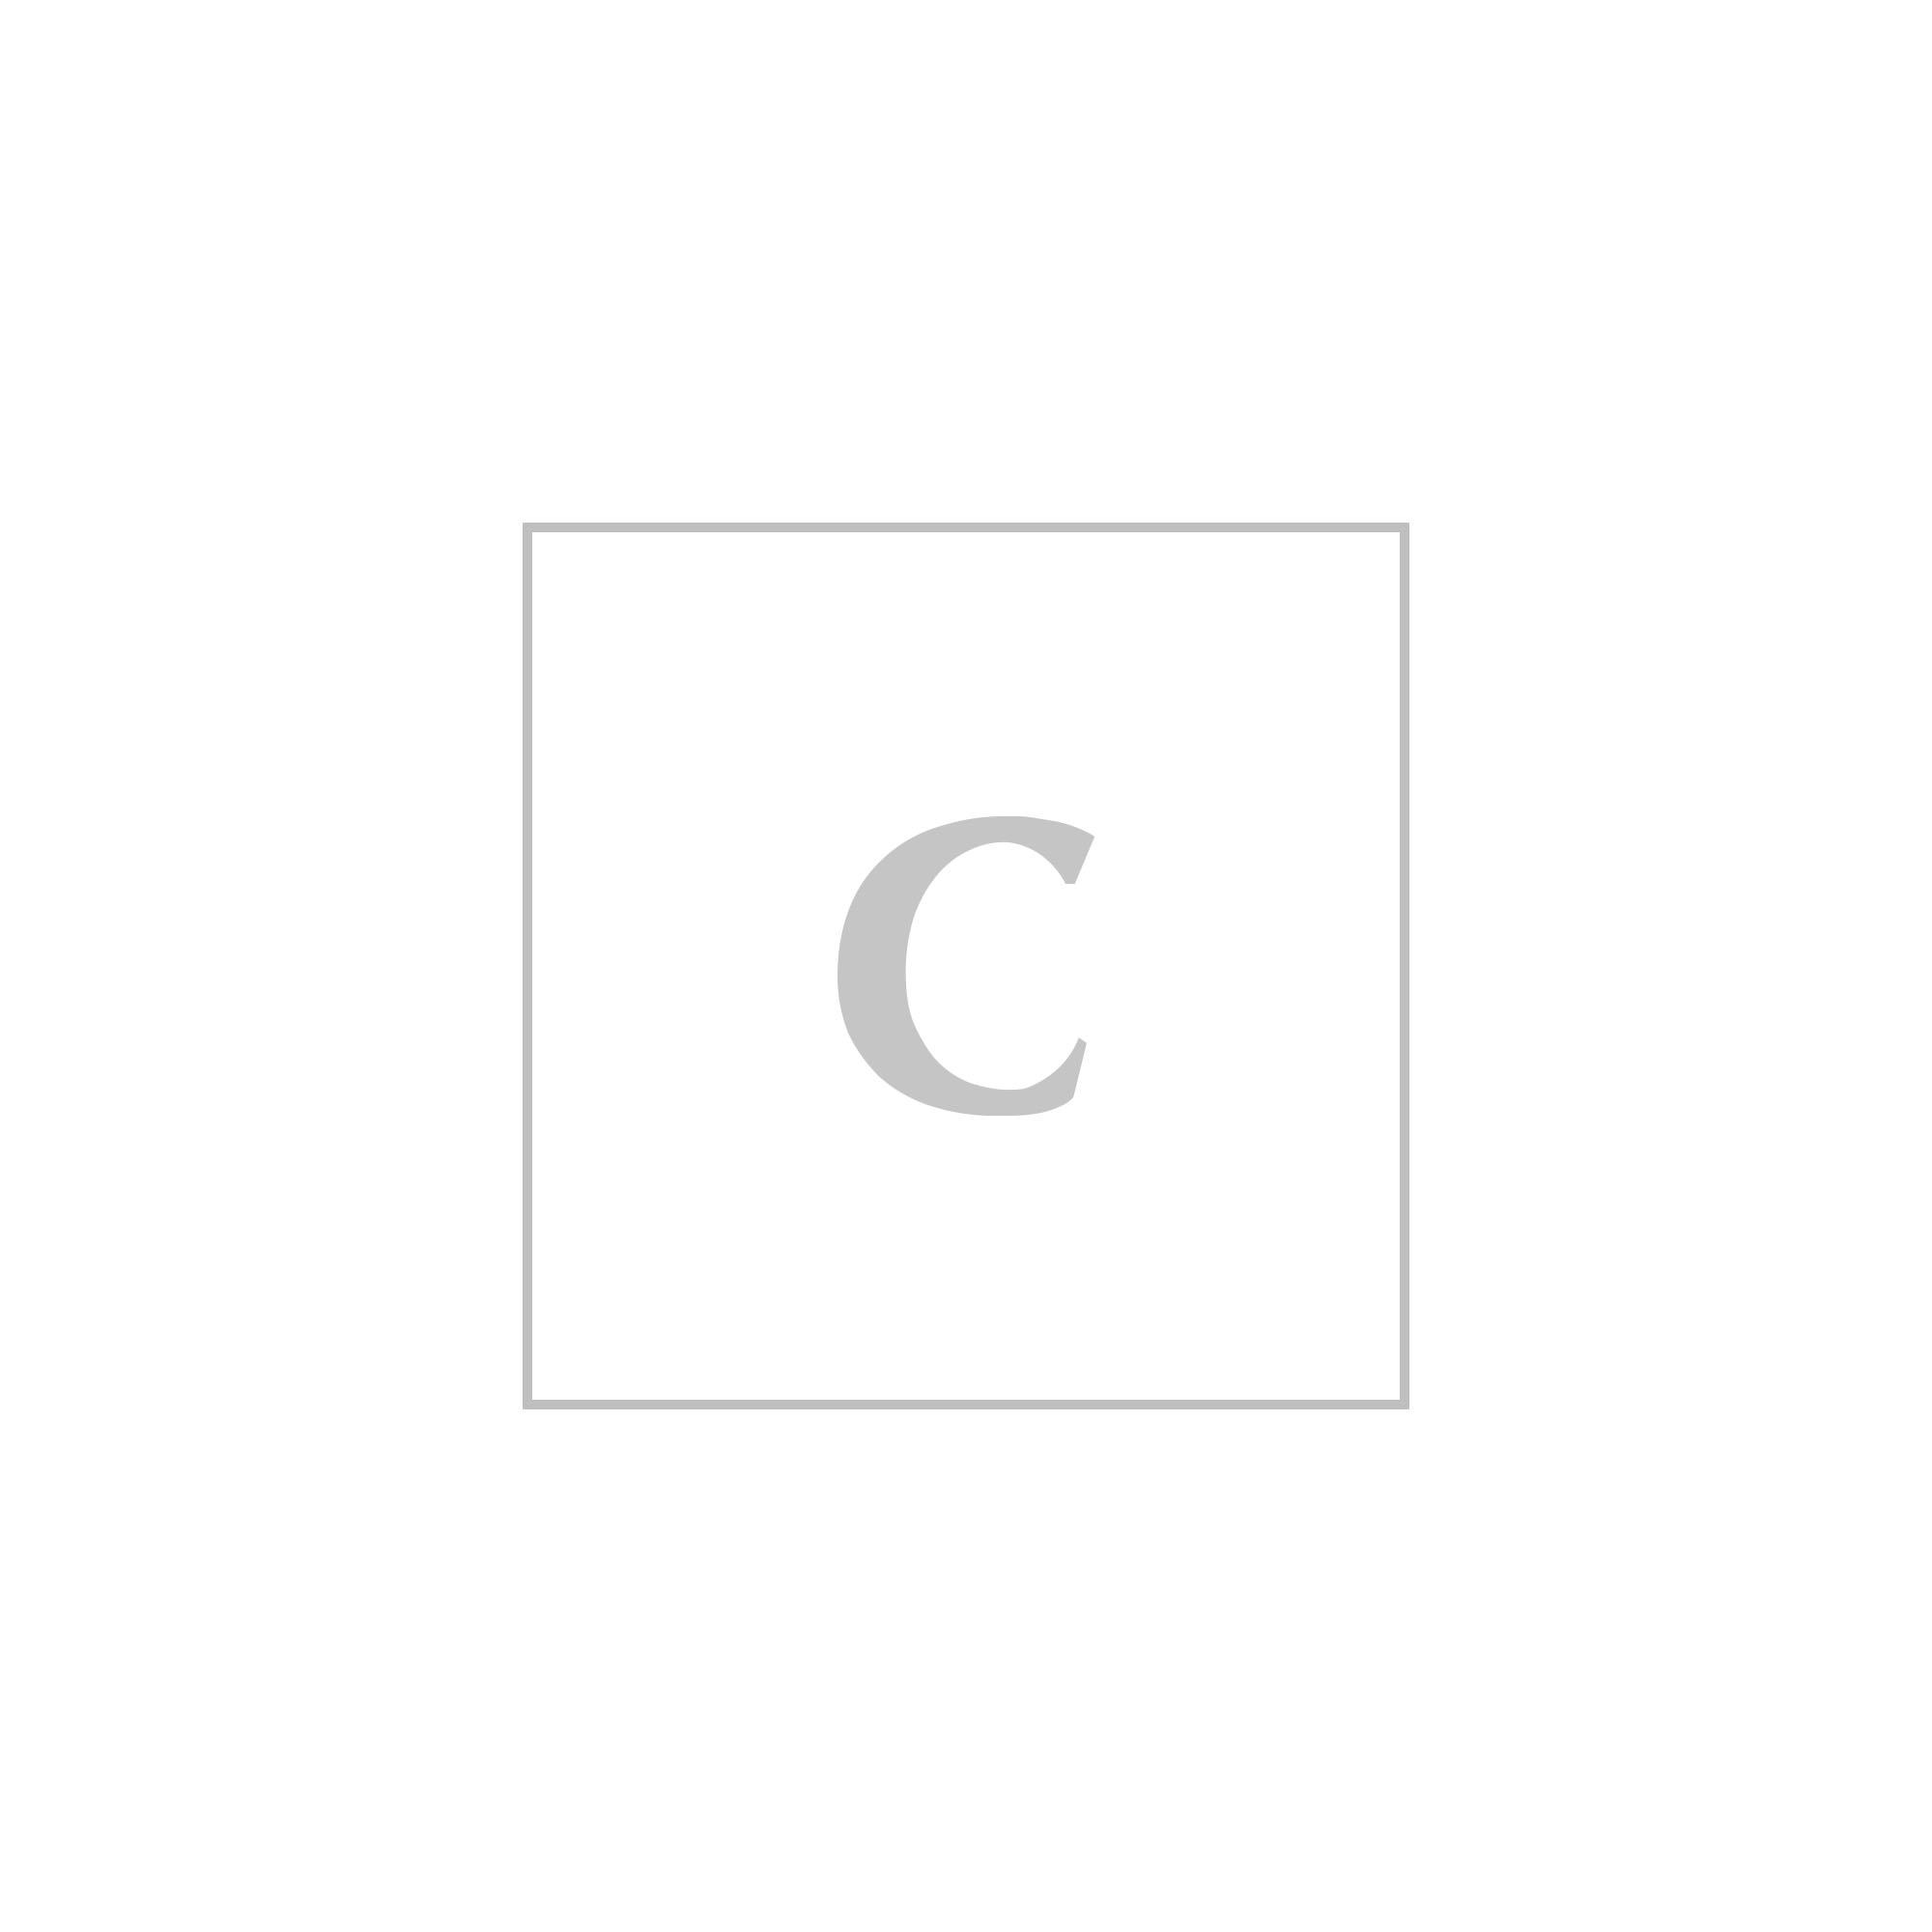 moncler coat dubai zone for sale moncler online. Black Bedroom Furniture Sets. Home Design Ideas